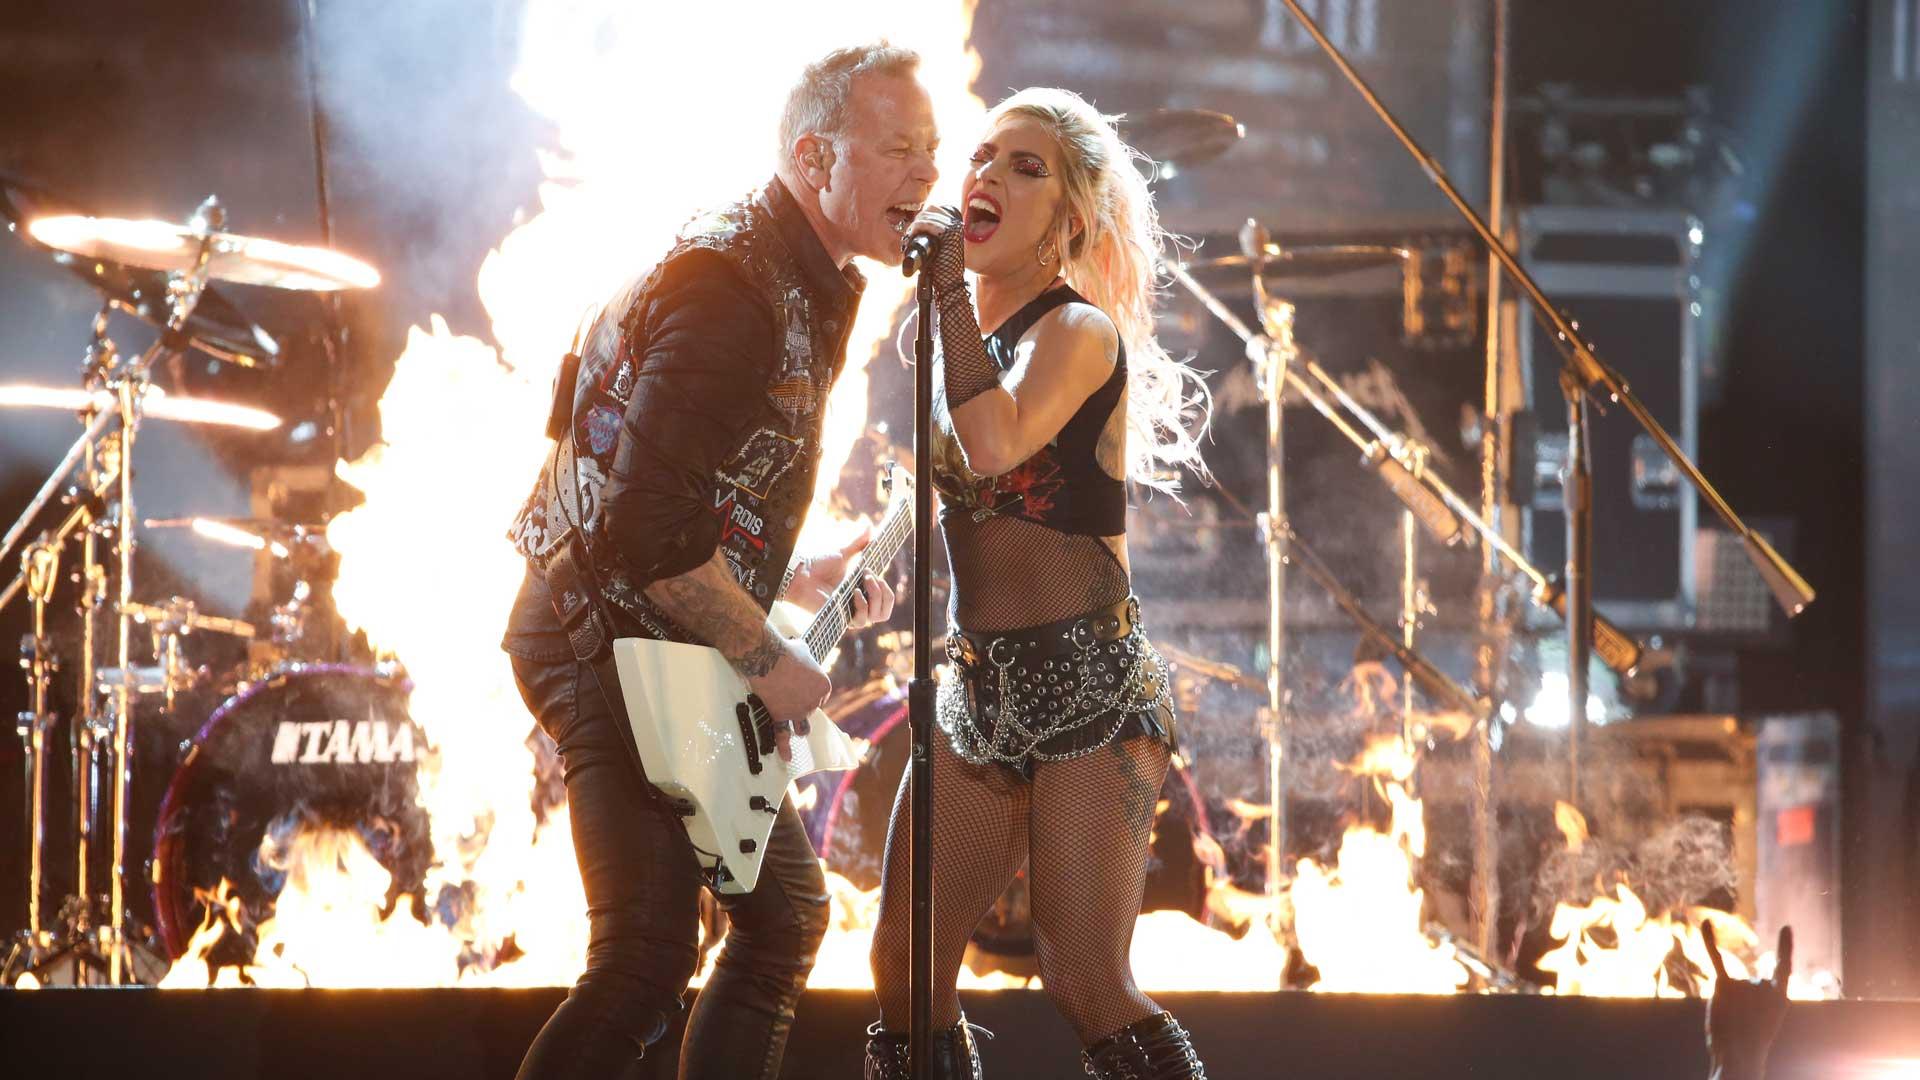 Metallica featuring Lady Gaga perform